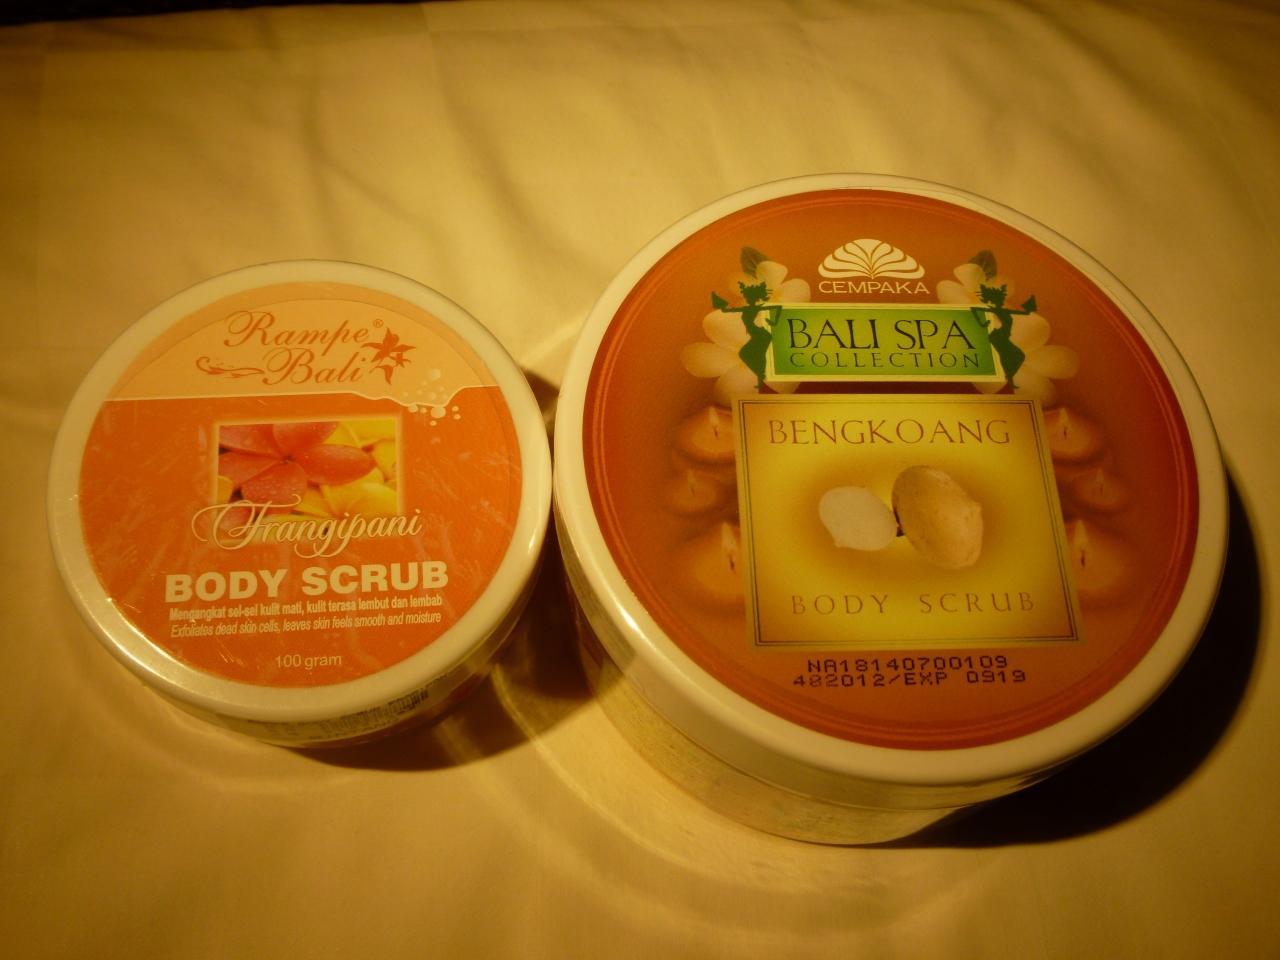 Cempaka Bali Spa Collection 200ml Green Tea Body Scrub Lulur Kris Mandi With Bangkoang Ekstract 250 Ml 1000g Coconut Daftar Source Br